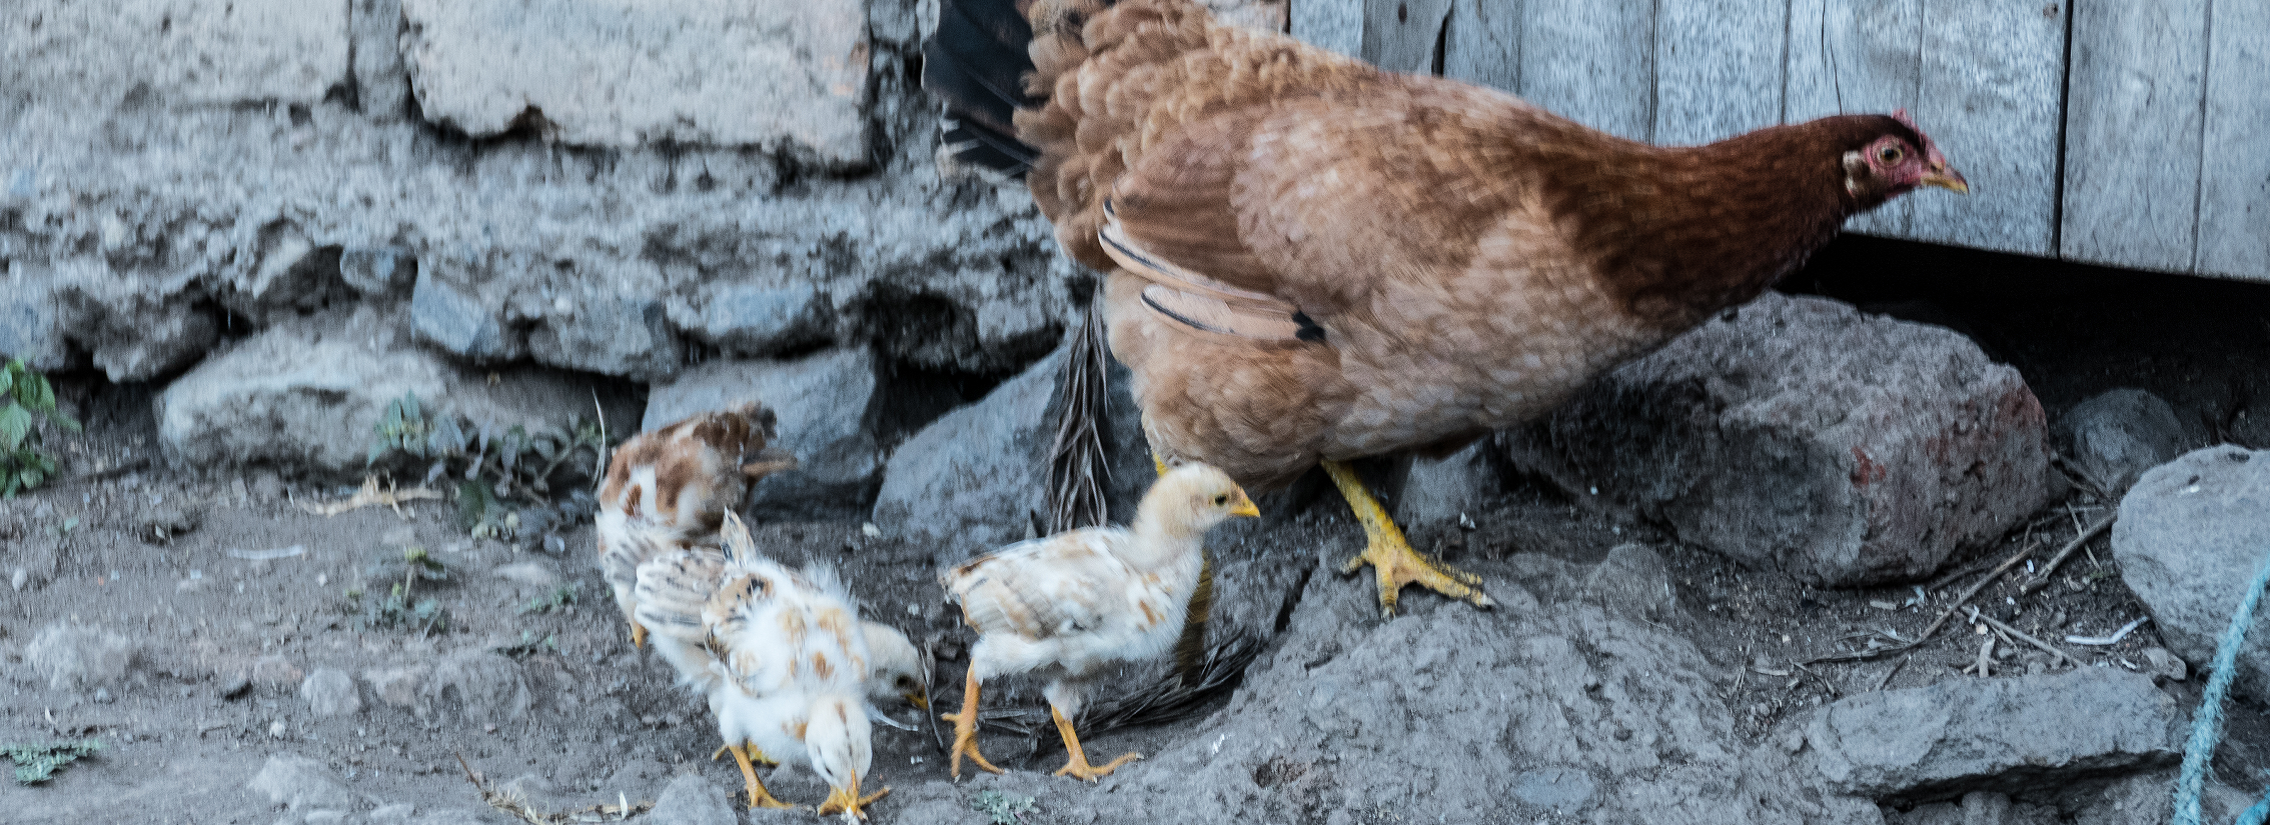 Women-led chicken seed dissemination - Ethiopia & Tanzania